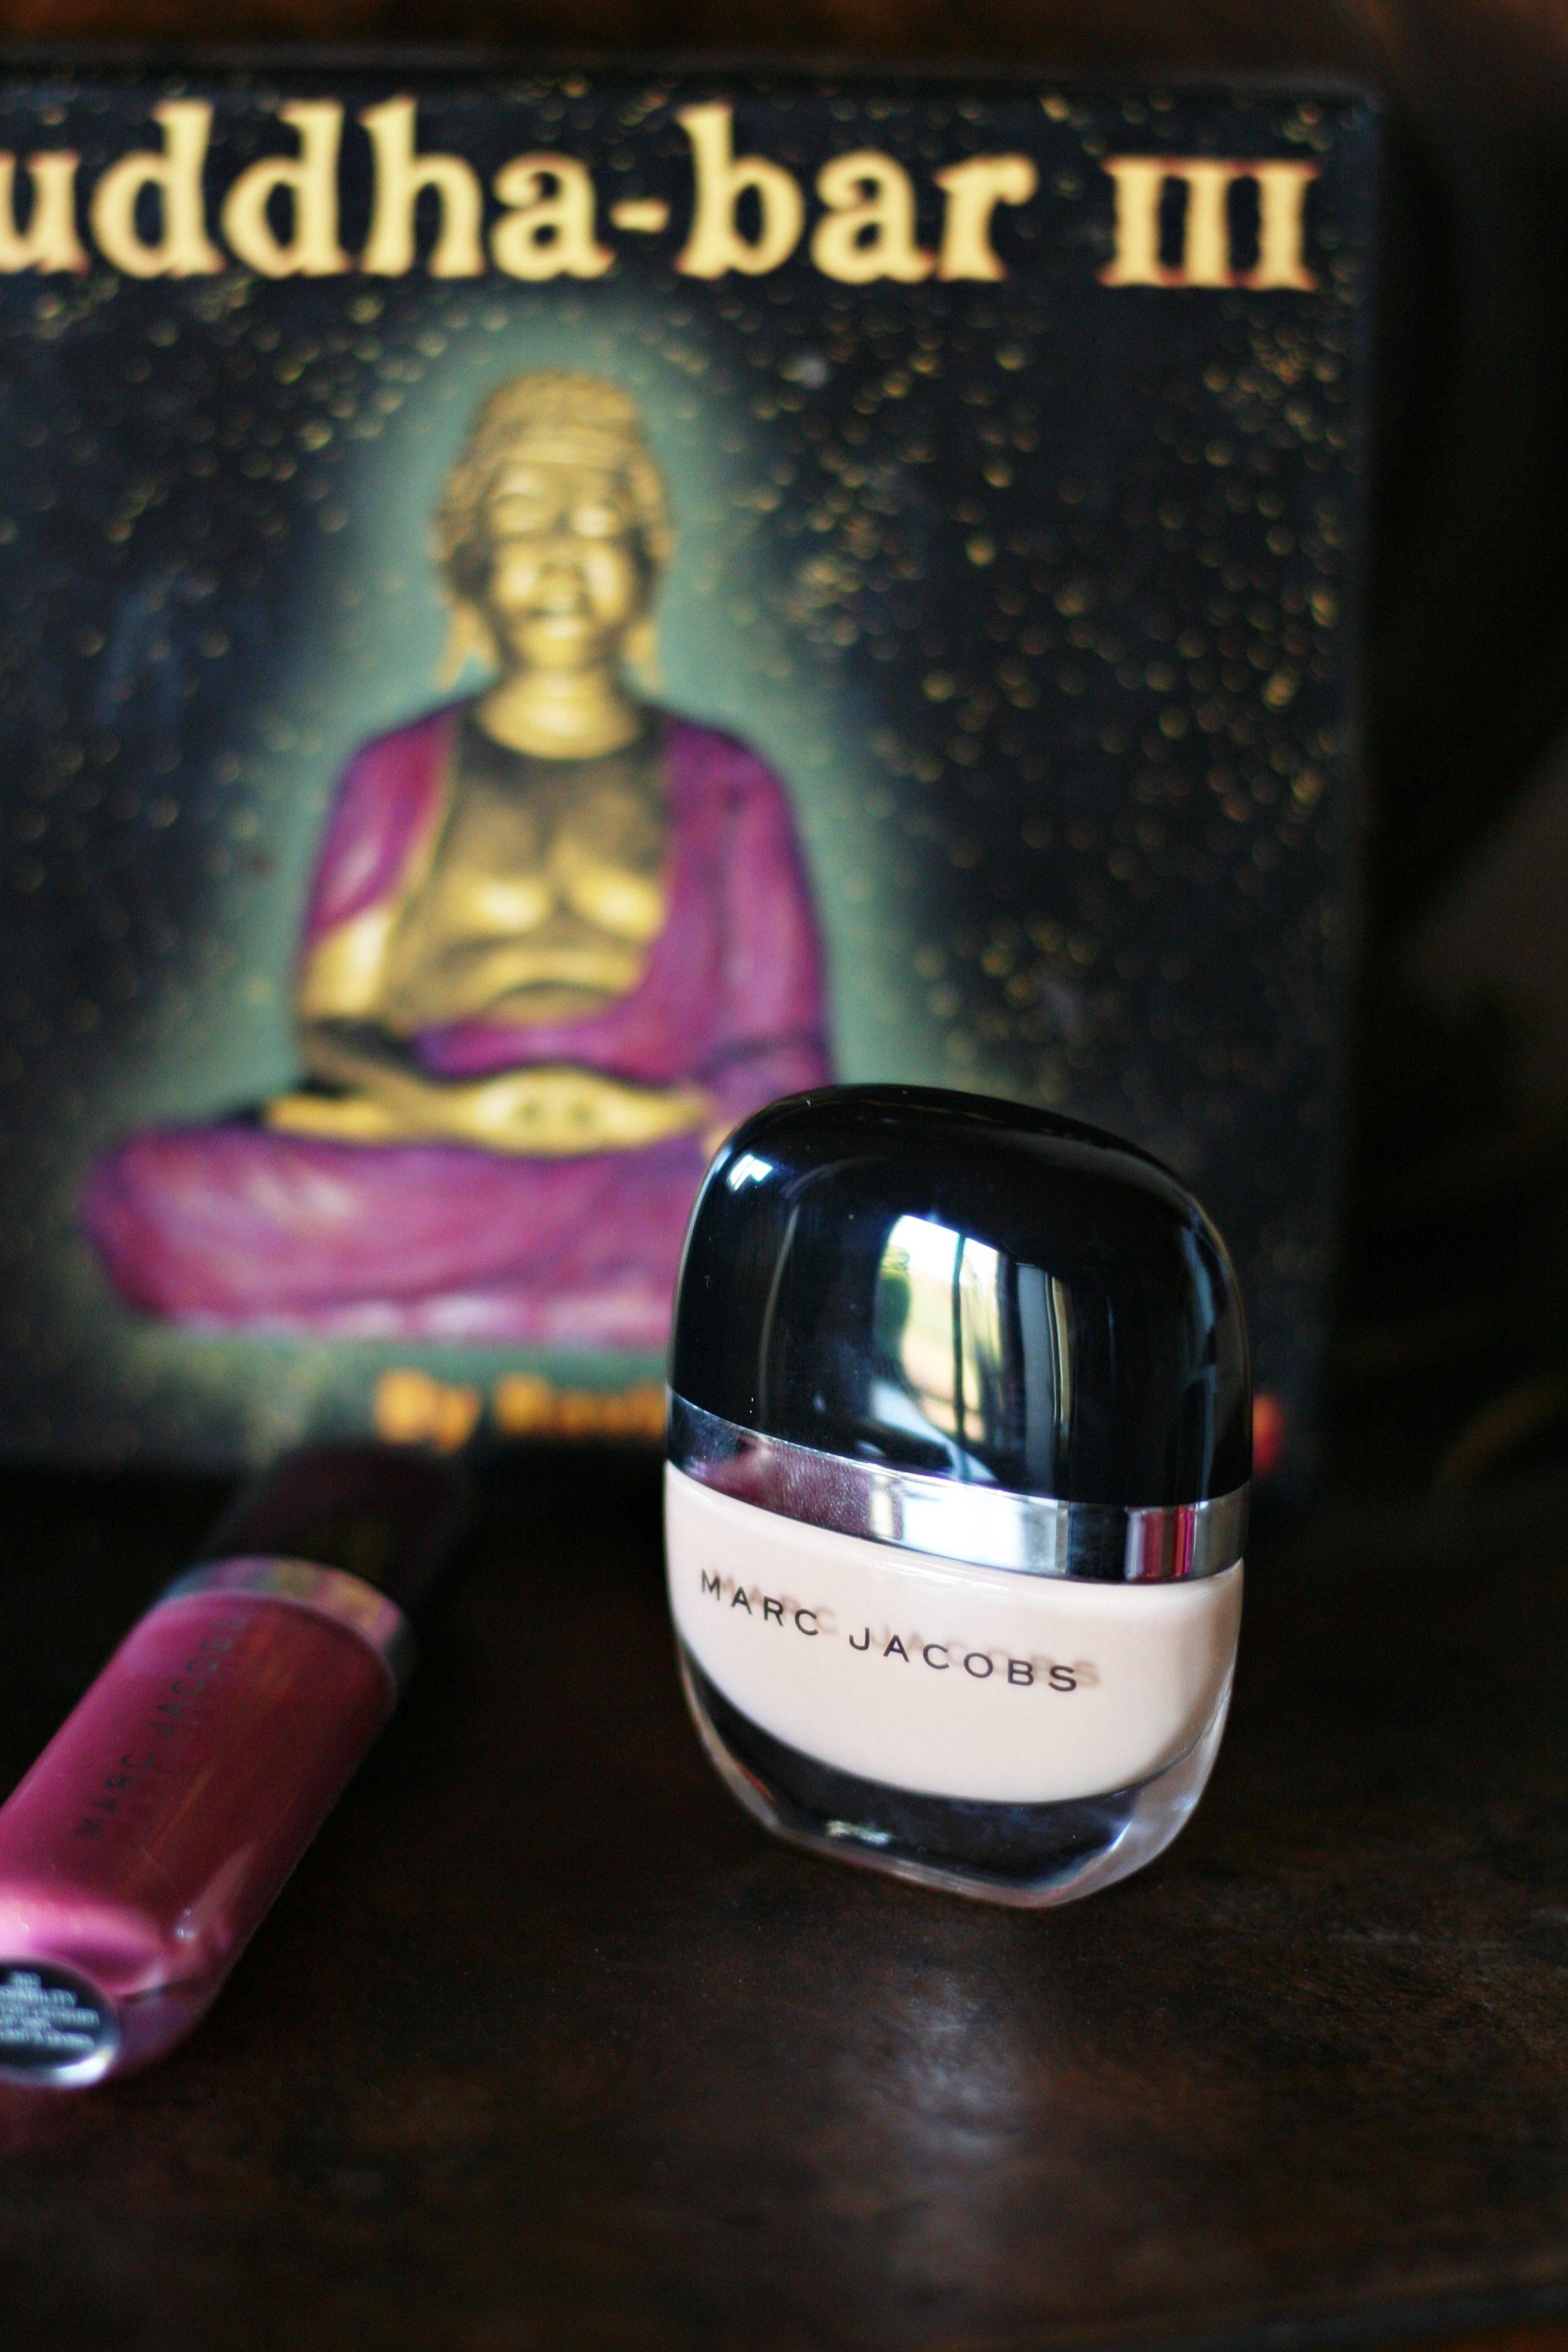 marcjacobs-maquillage-sephora